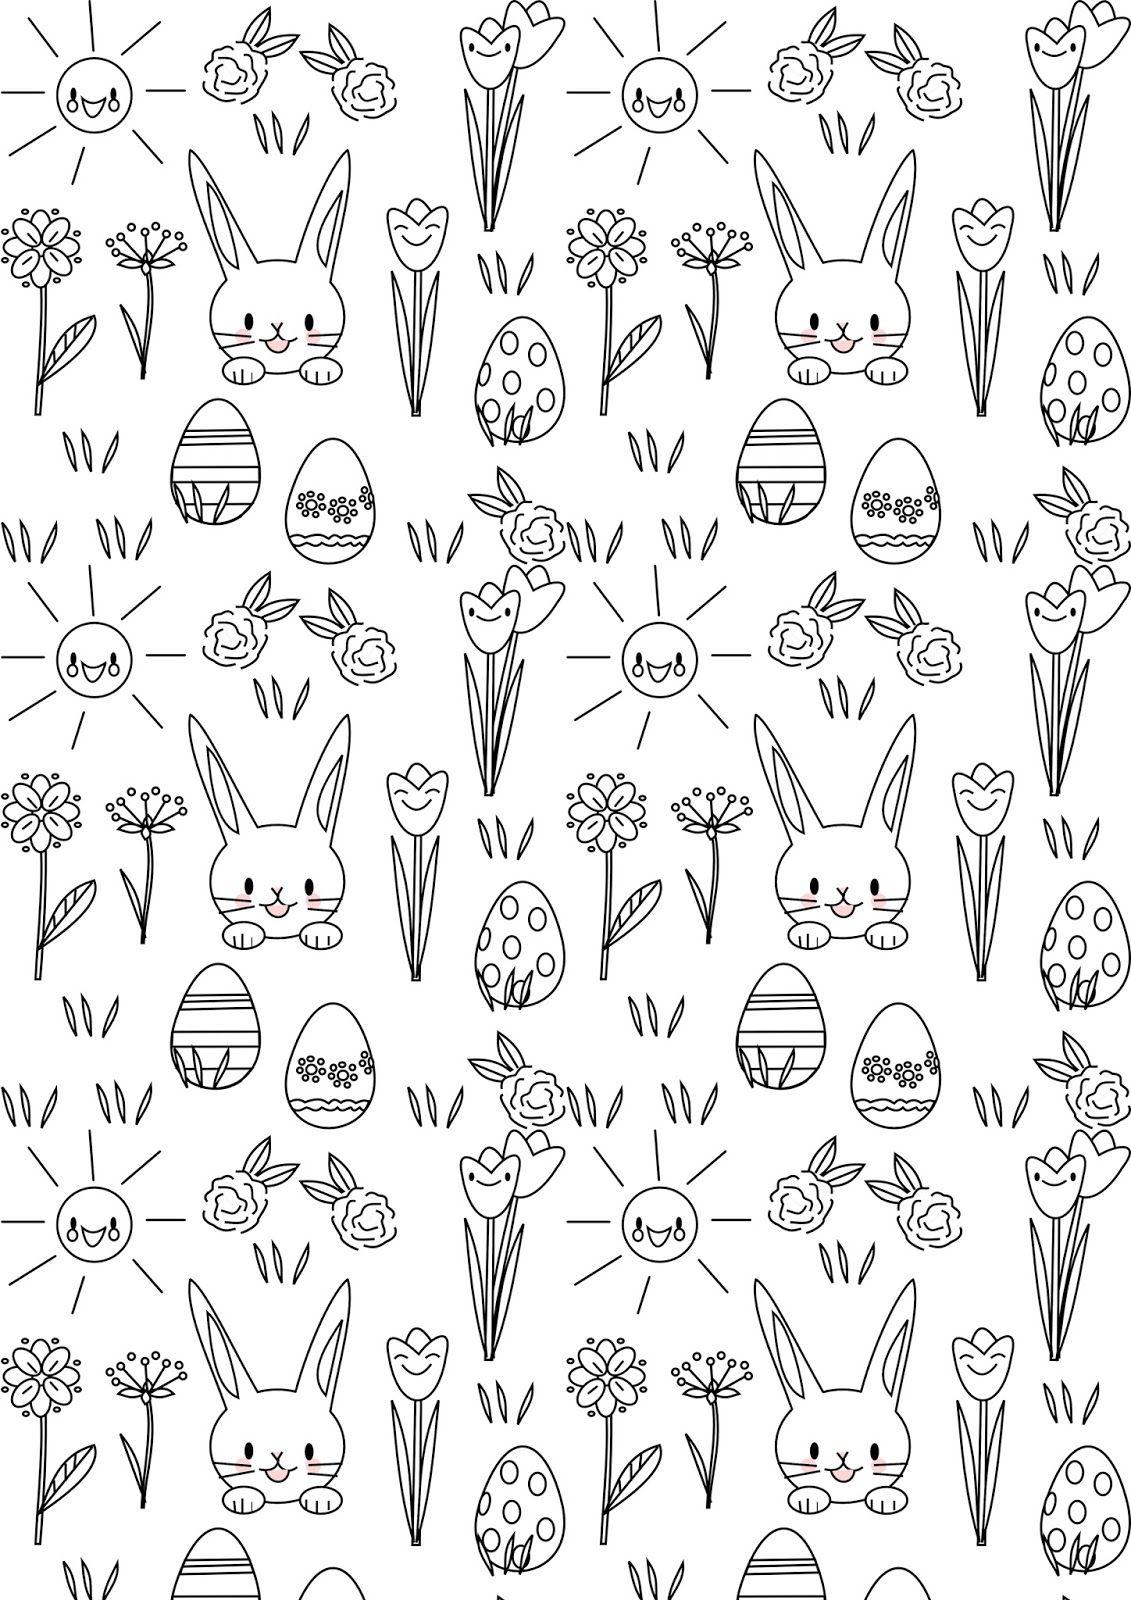 pineapple pattern | coloring | Pinterest | Las fiestas, Viva la y ...